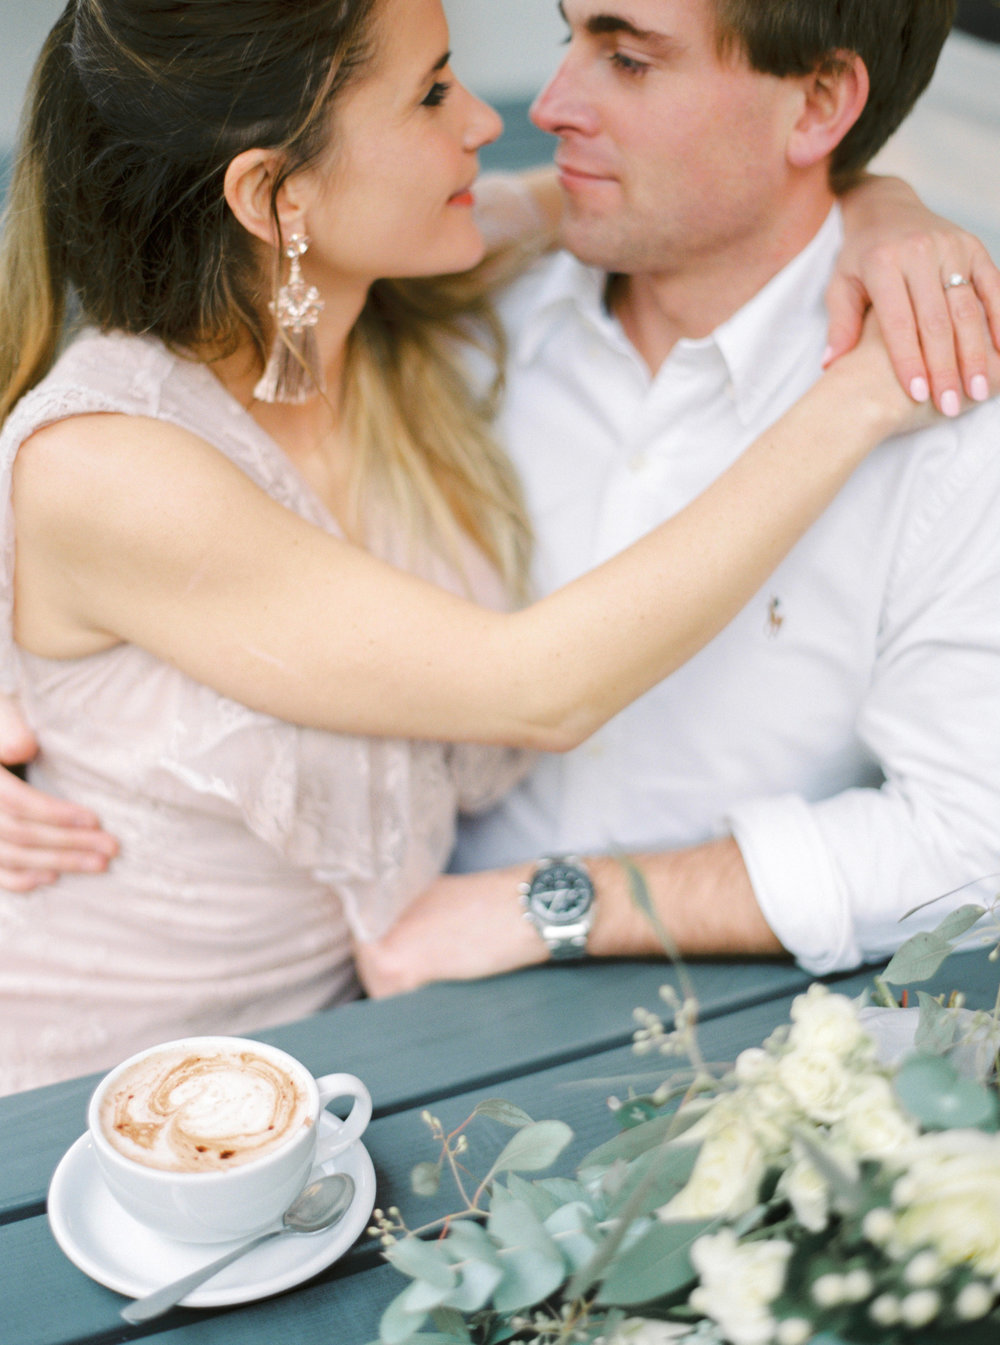 Luxury Wedding Planner UK | Our Chic & Romantic Engagement Shoot in Bath | Katie Julia Photography - 101.JPG